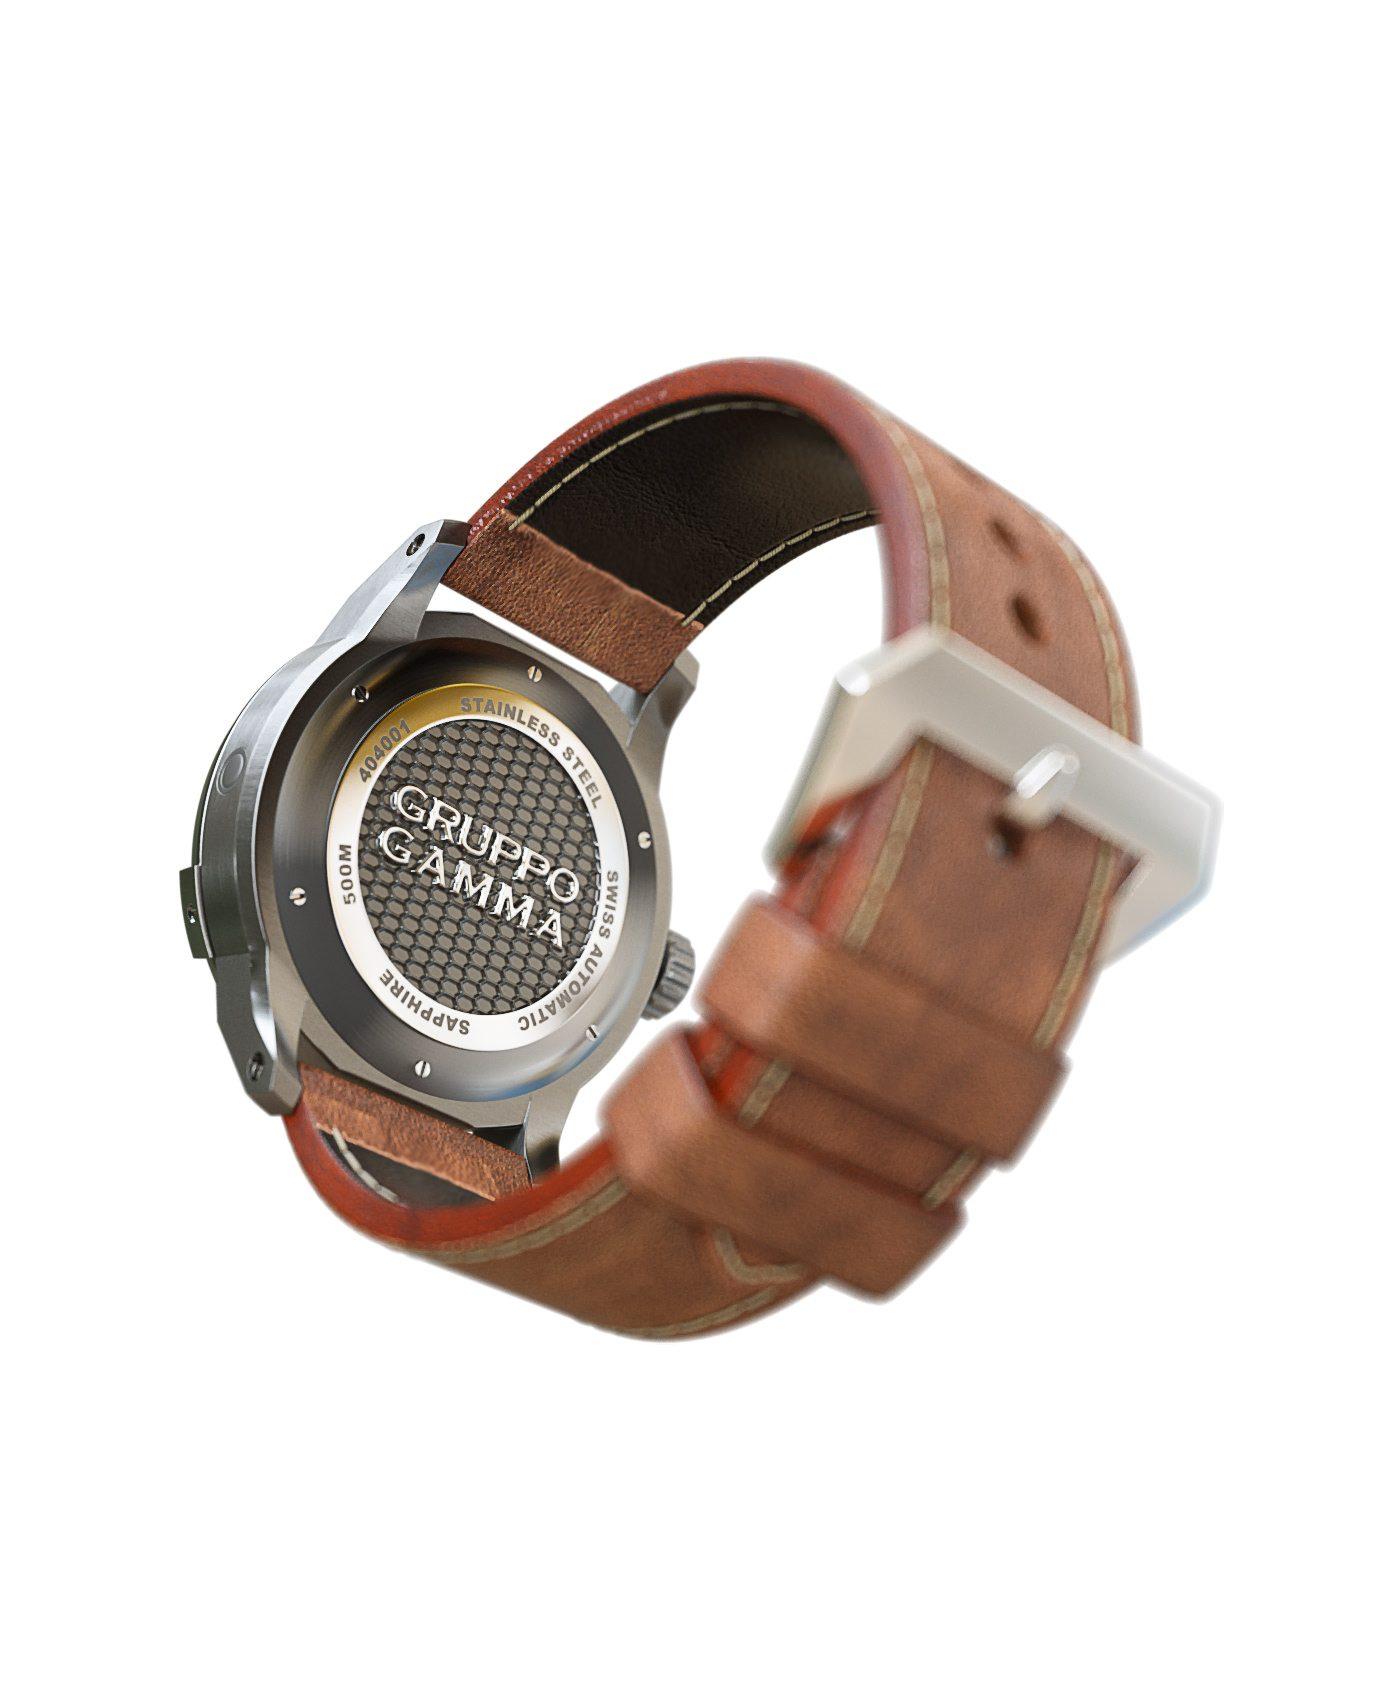 WatchBandit Gruppo Gamma - Divemaster - DG-01 Vintage Lume back